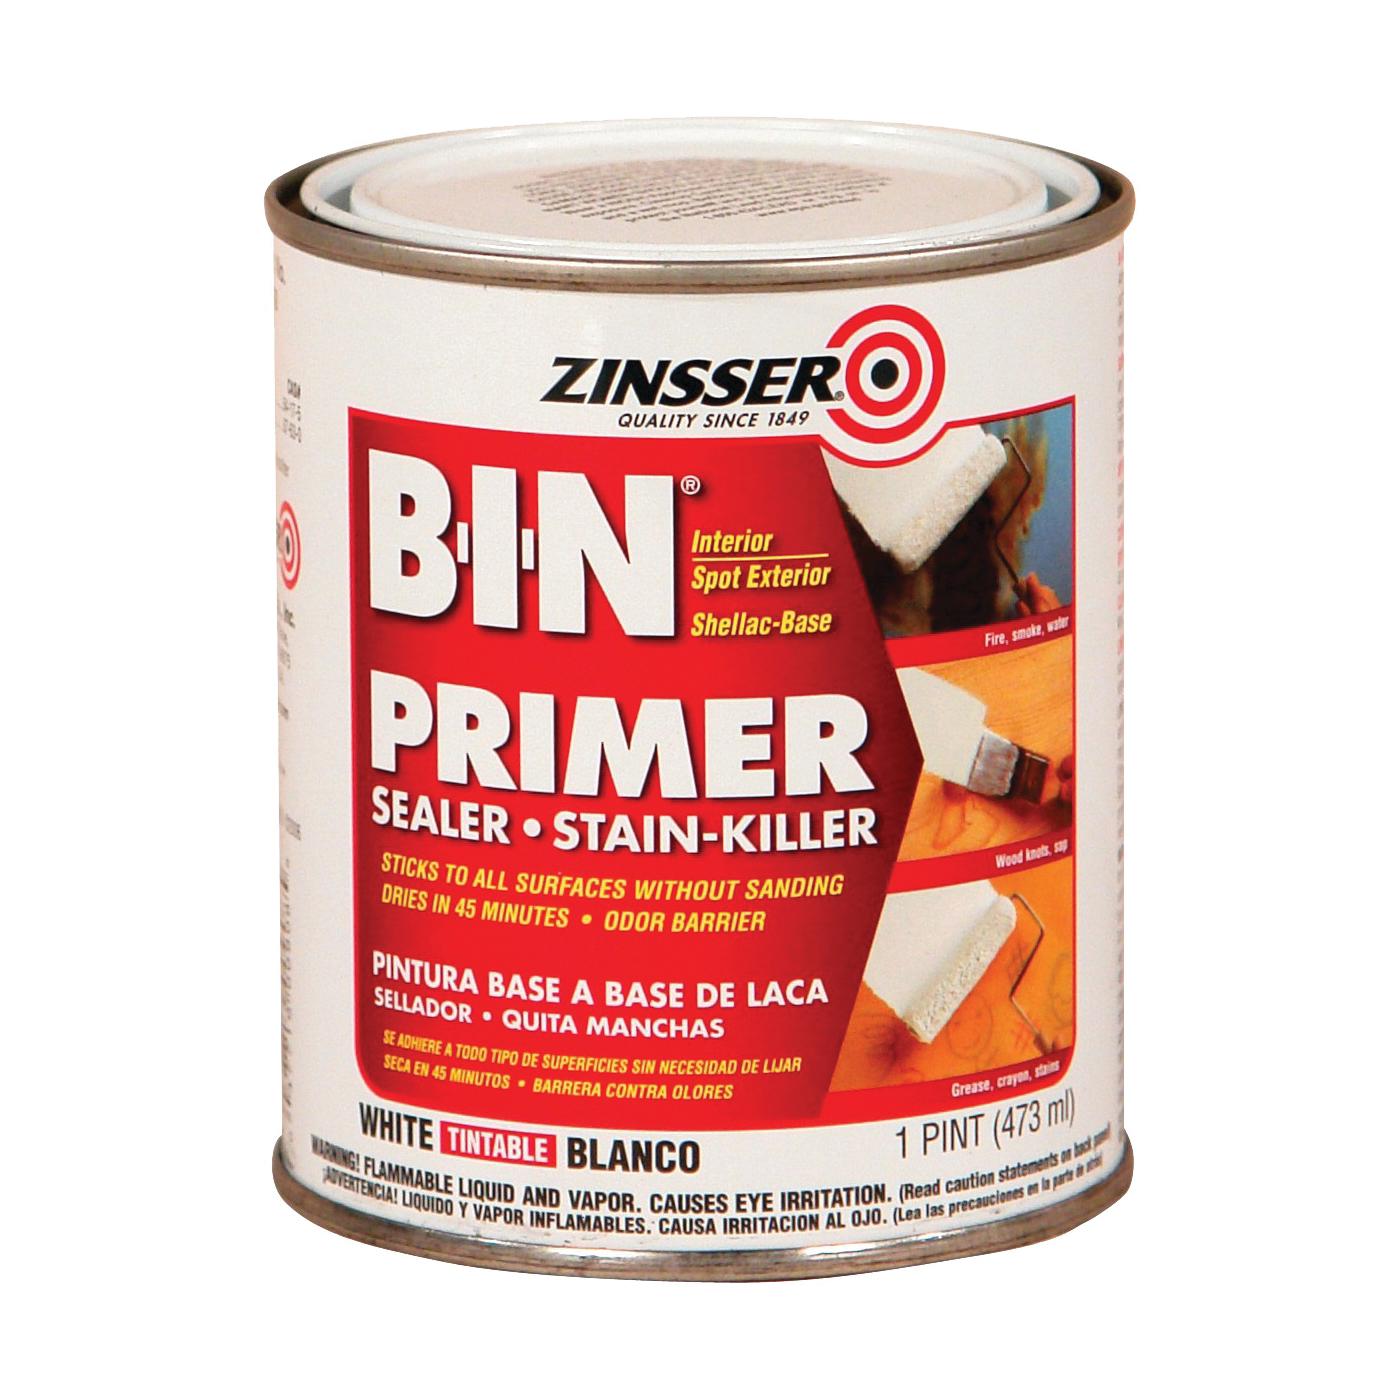 Picture of ZINSSER B-I-N 00908 Shellac-Base Primer, White, 1 pt, Pint